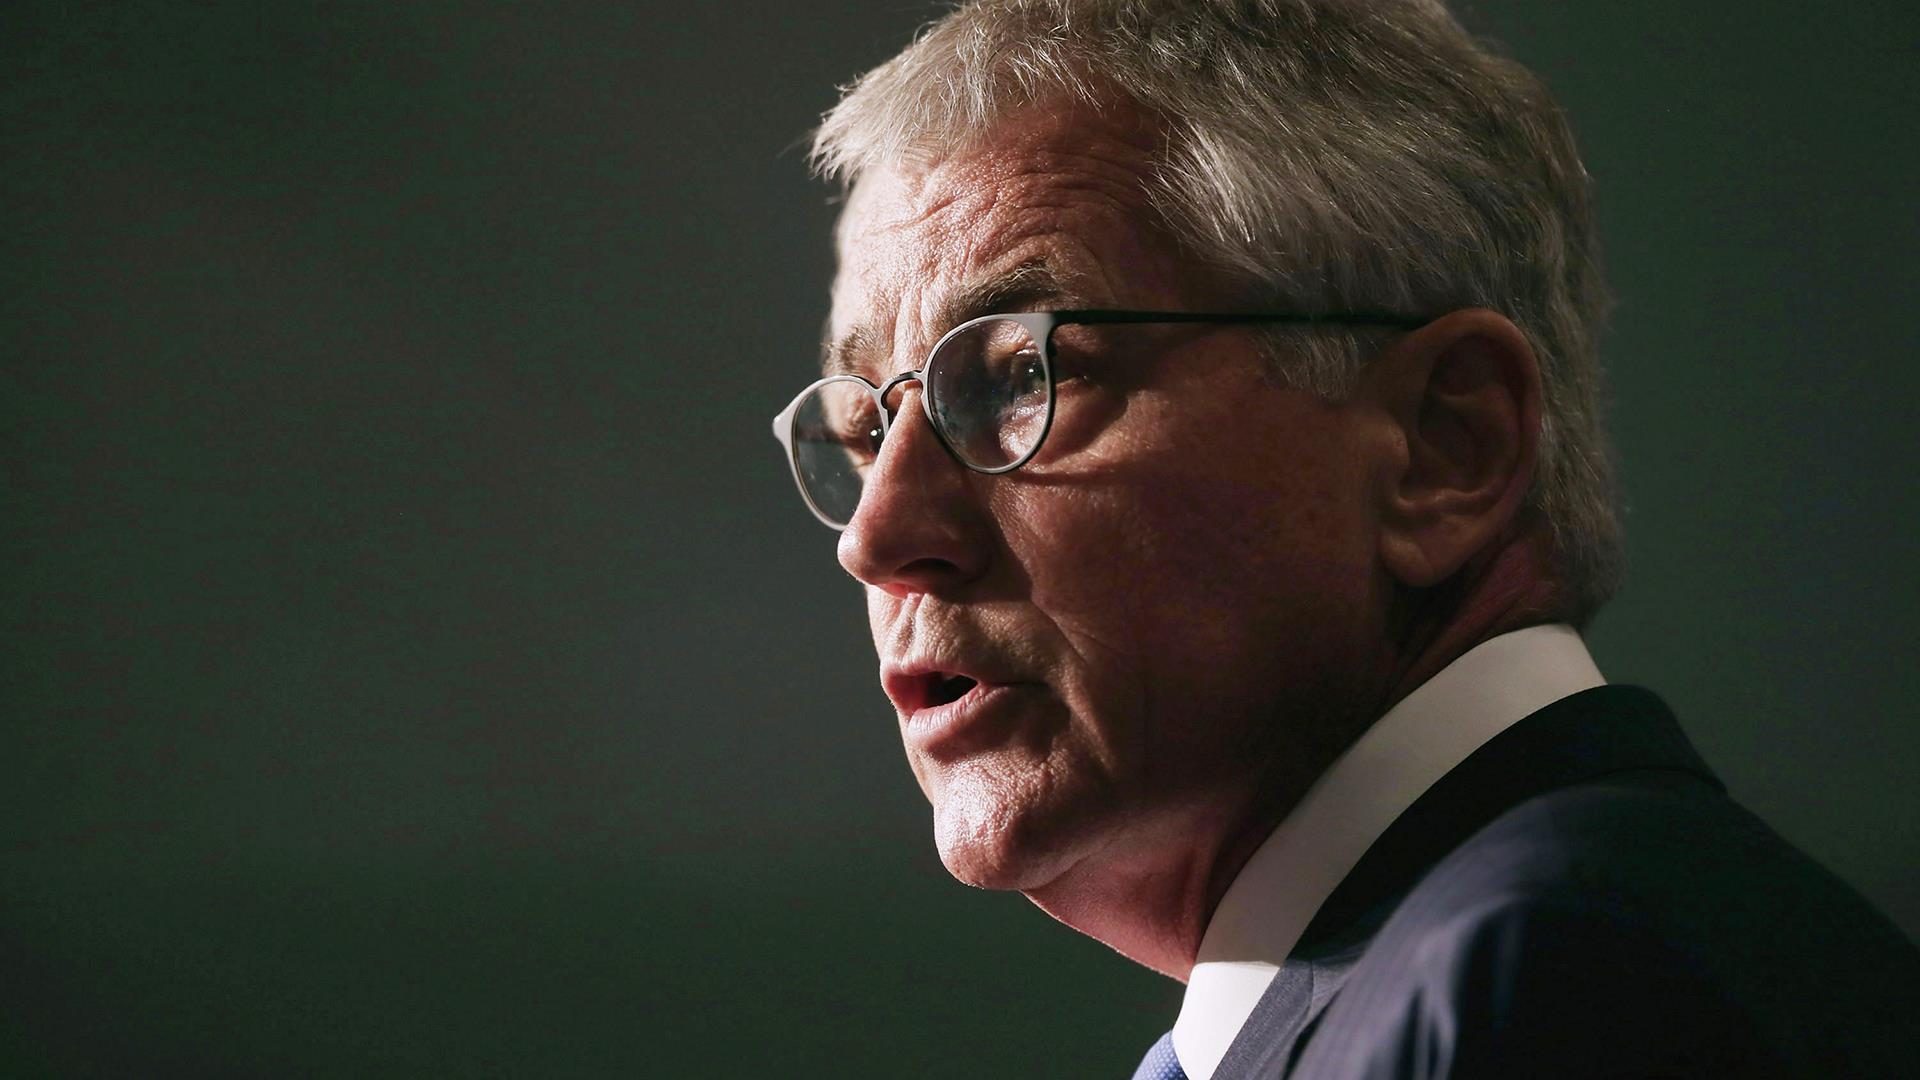 Hagel announces resignation, offers support